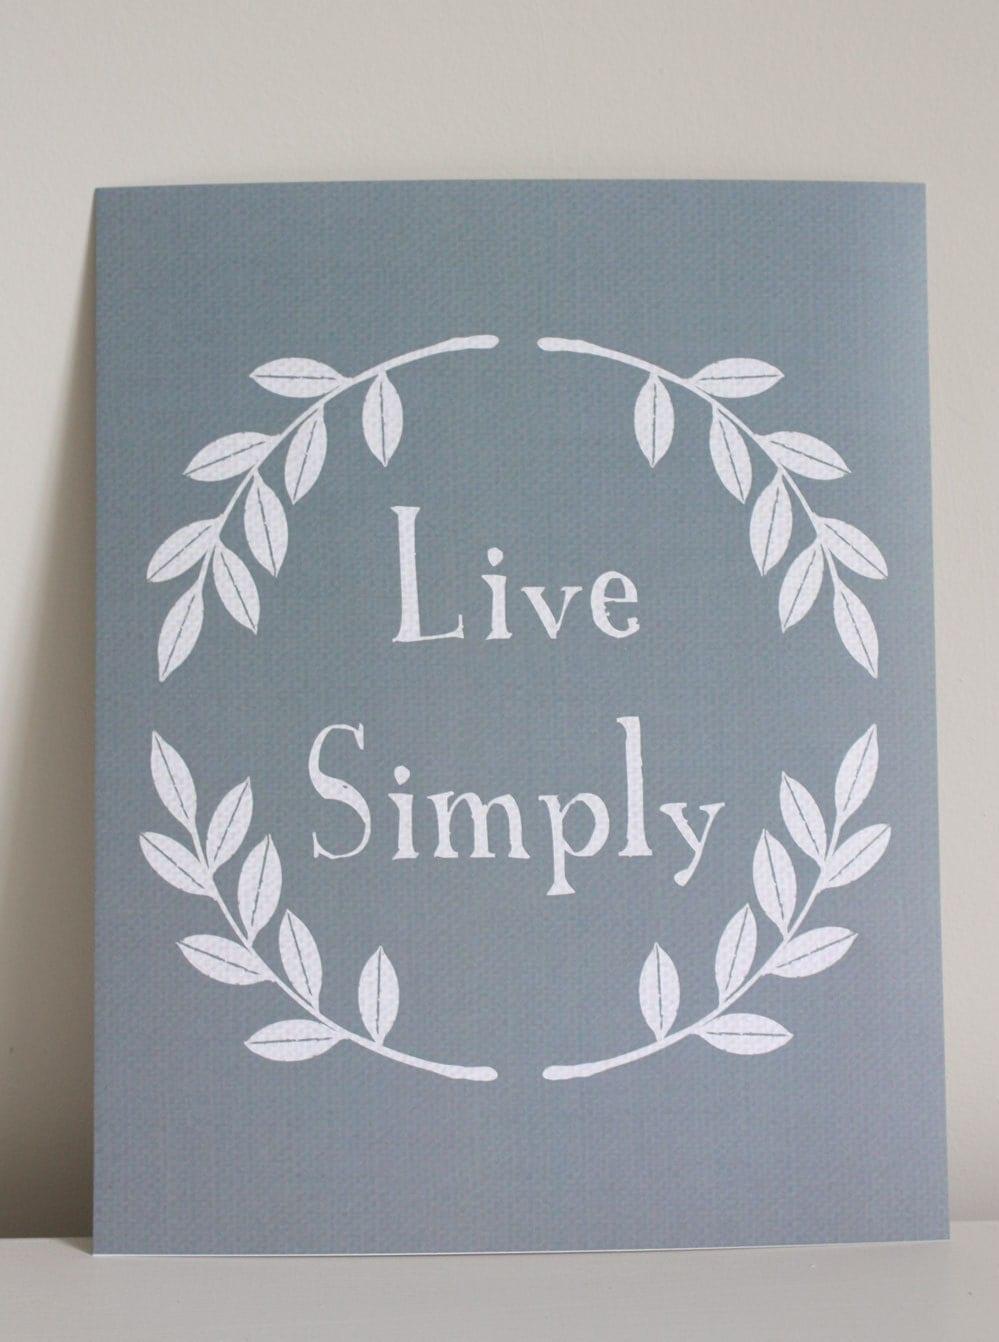 8x10 Live Simply print